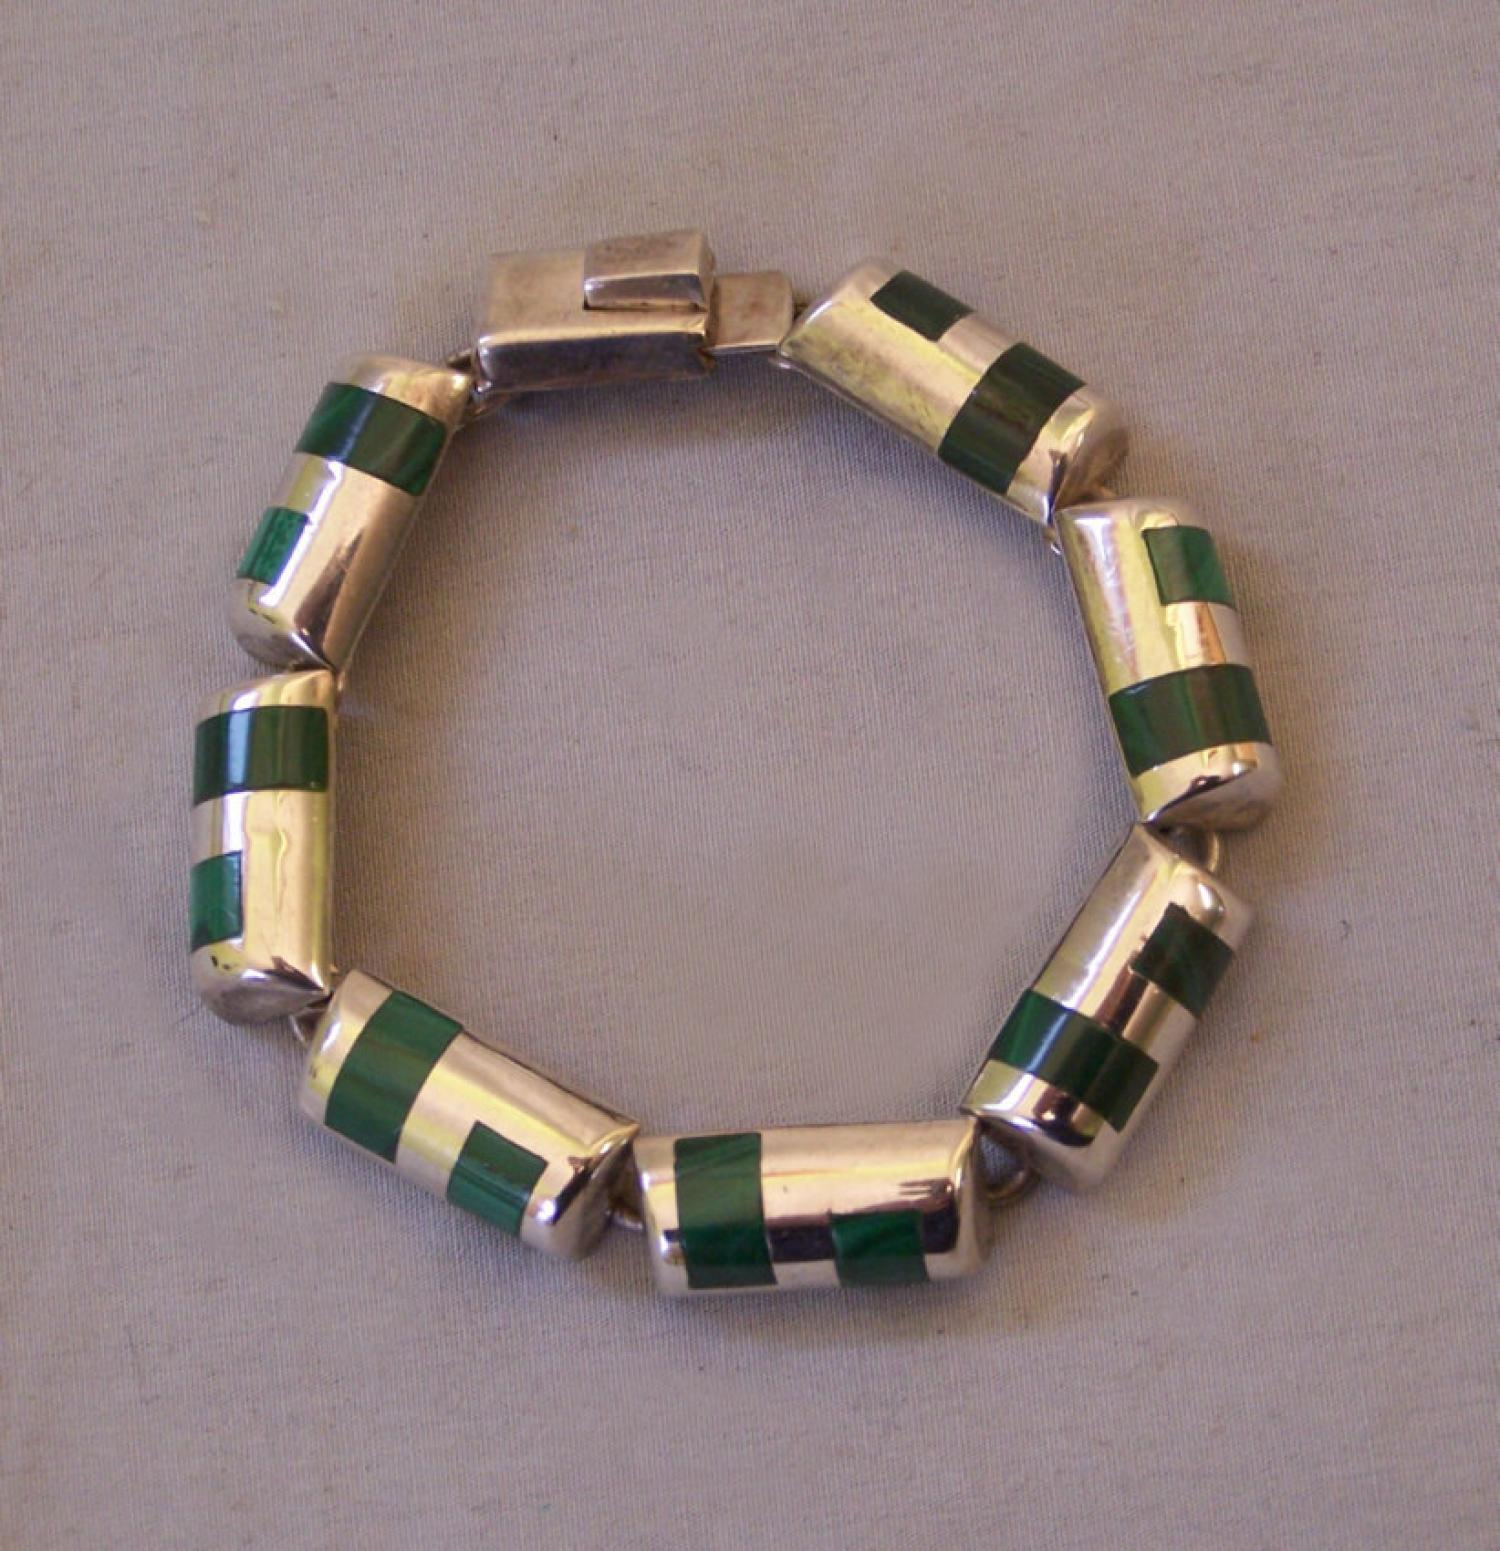 Taxco Mexico 950 silver malachite bracelet c1980